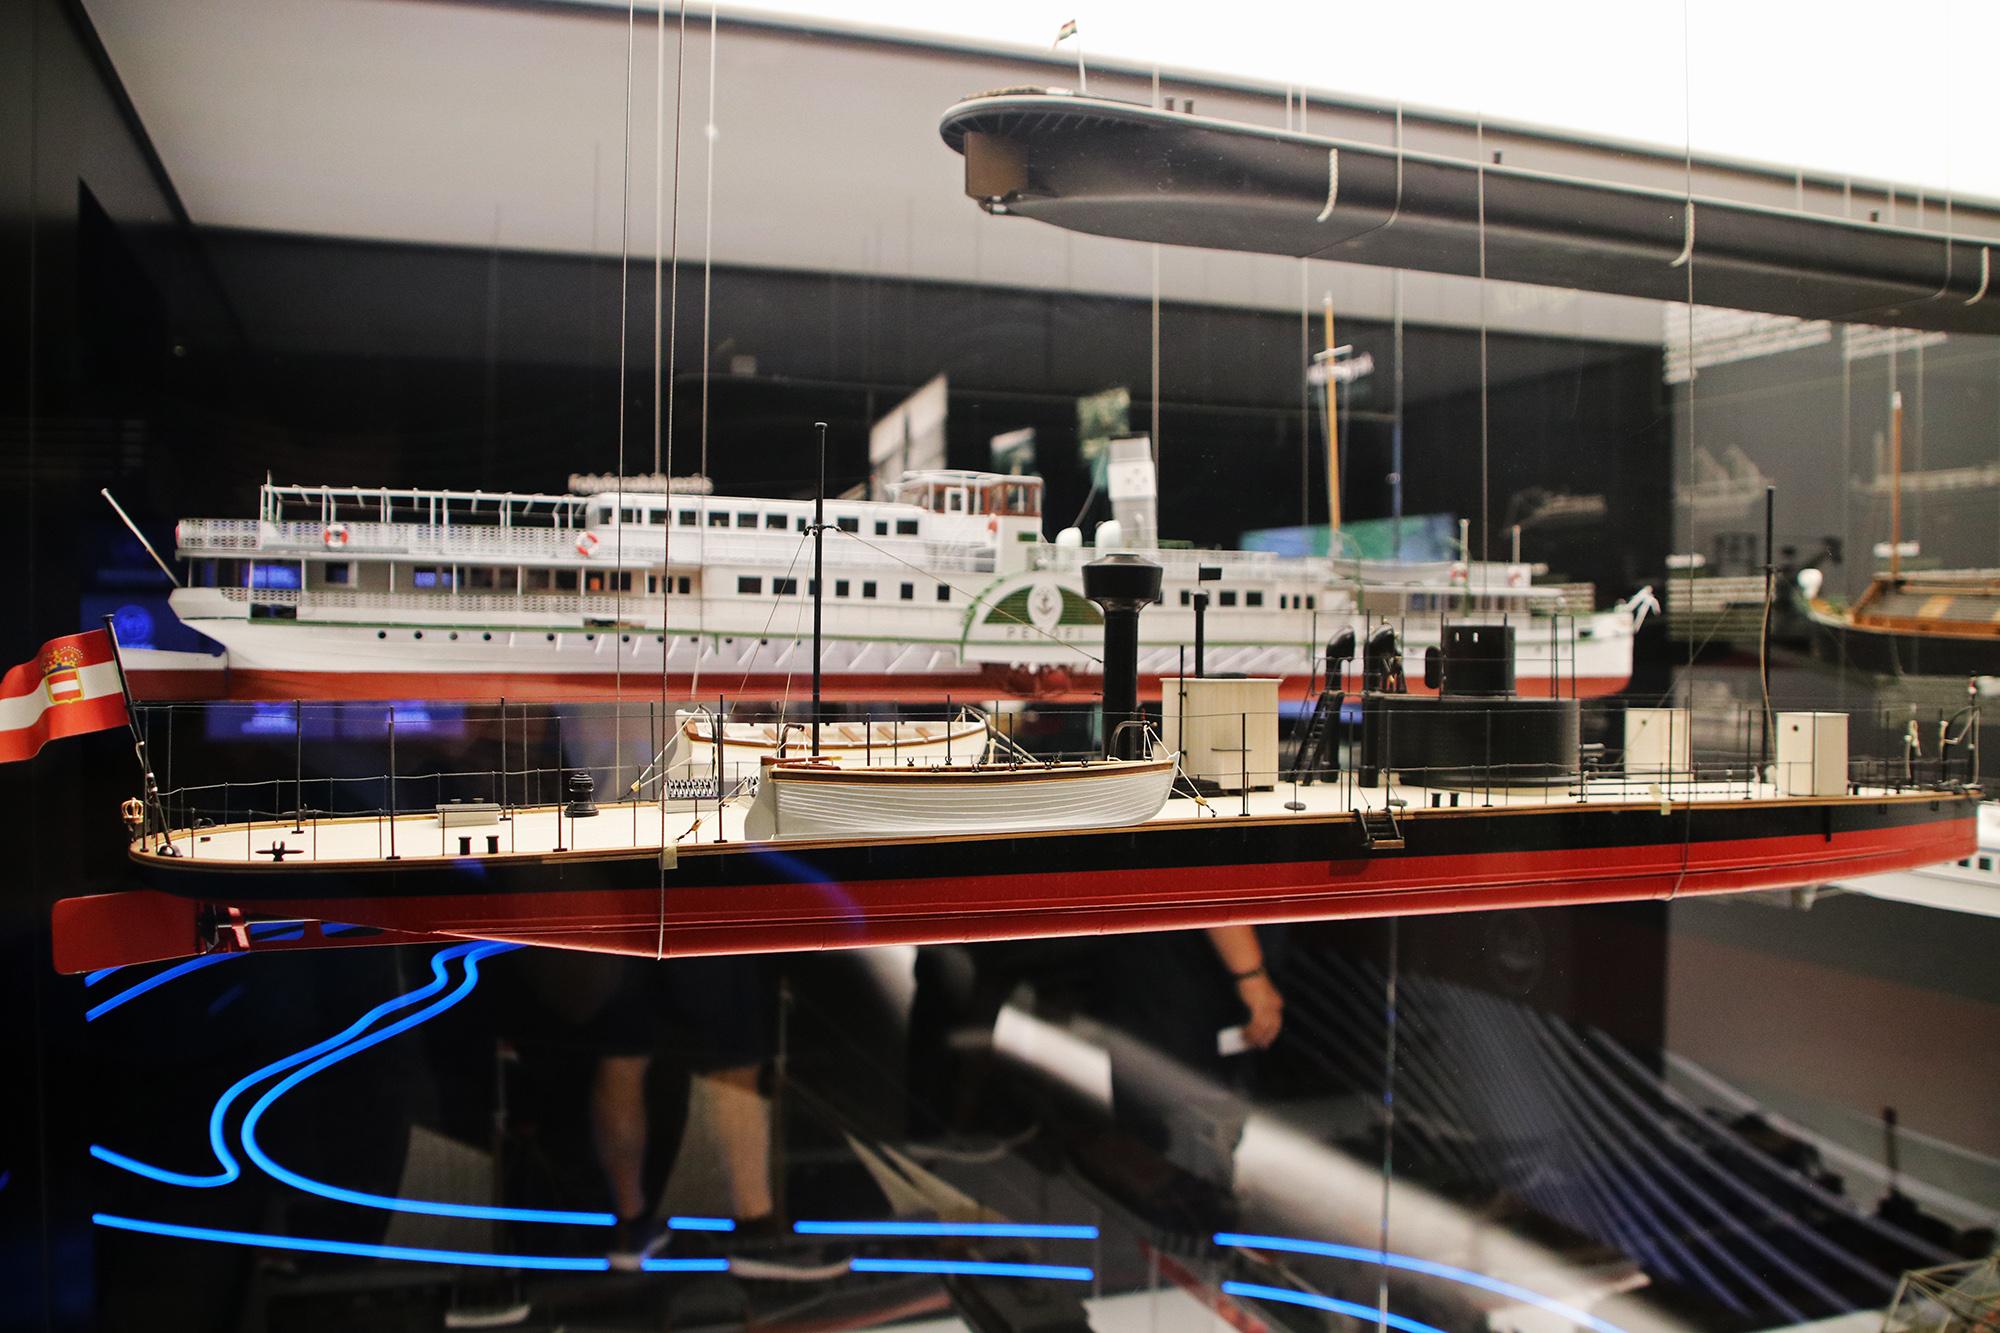 Hajónapló-A Monarchia üdvöskéje, a Lajta monitor hadihajó makettje